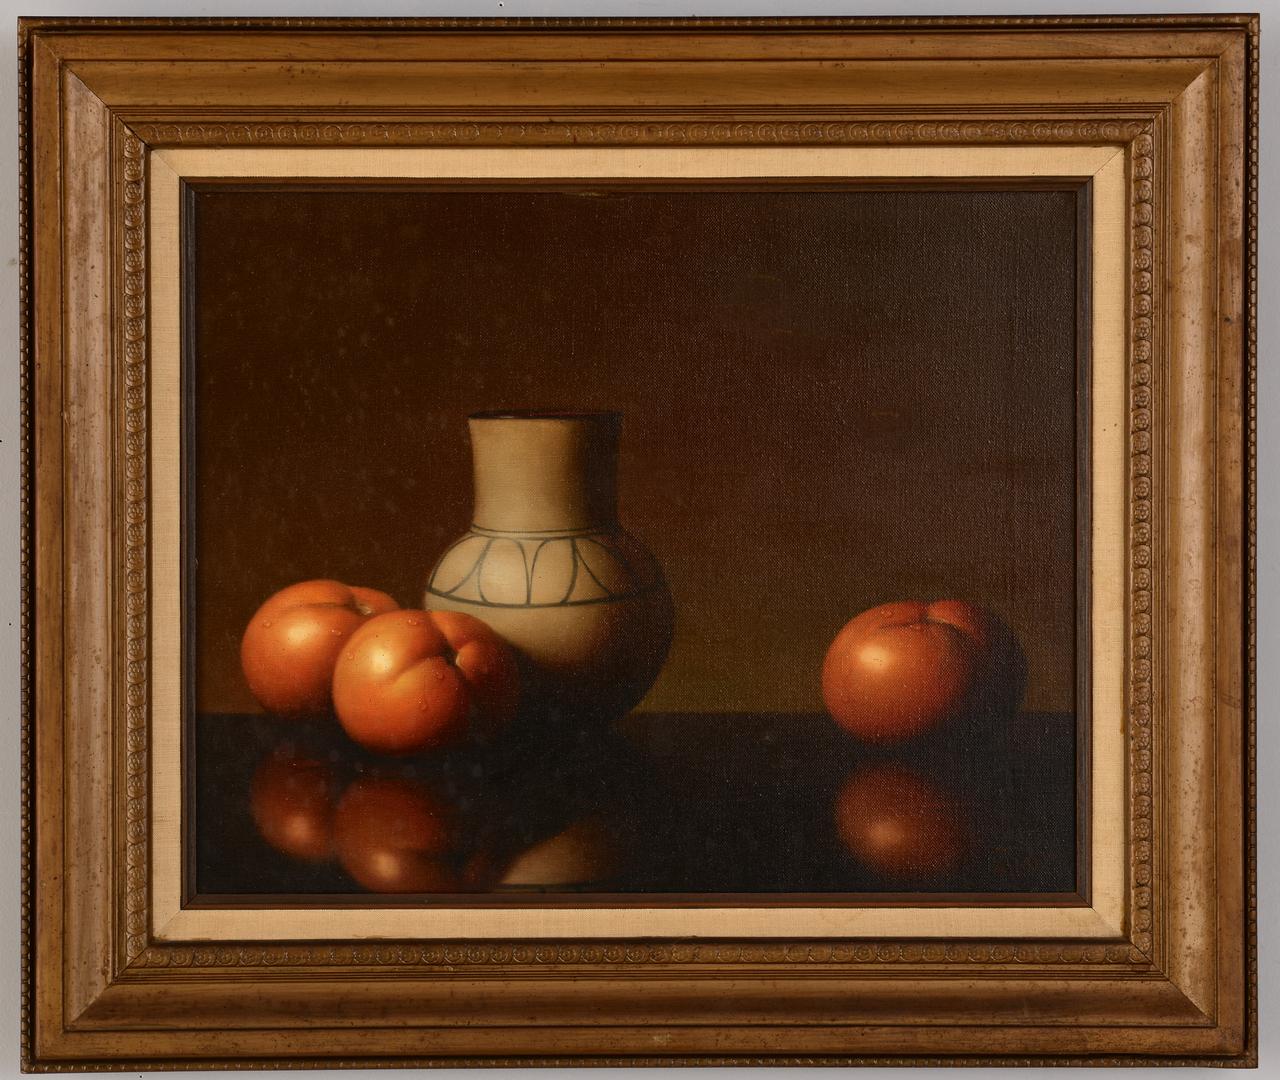 Lot 543: Al Jackson, Still Life with Tomatoes